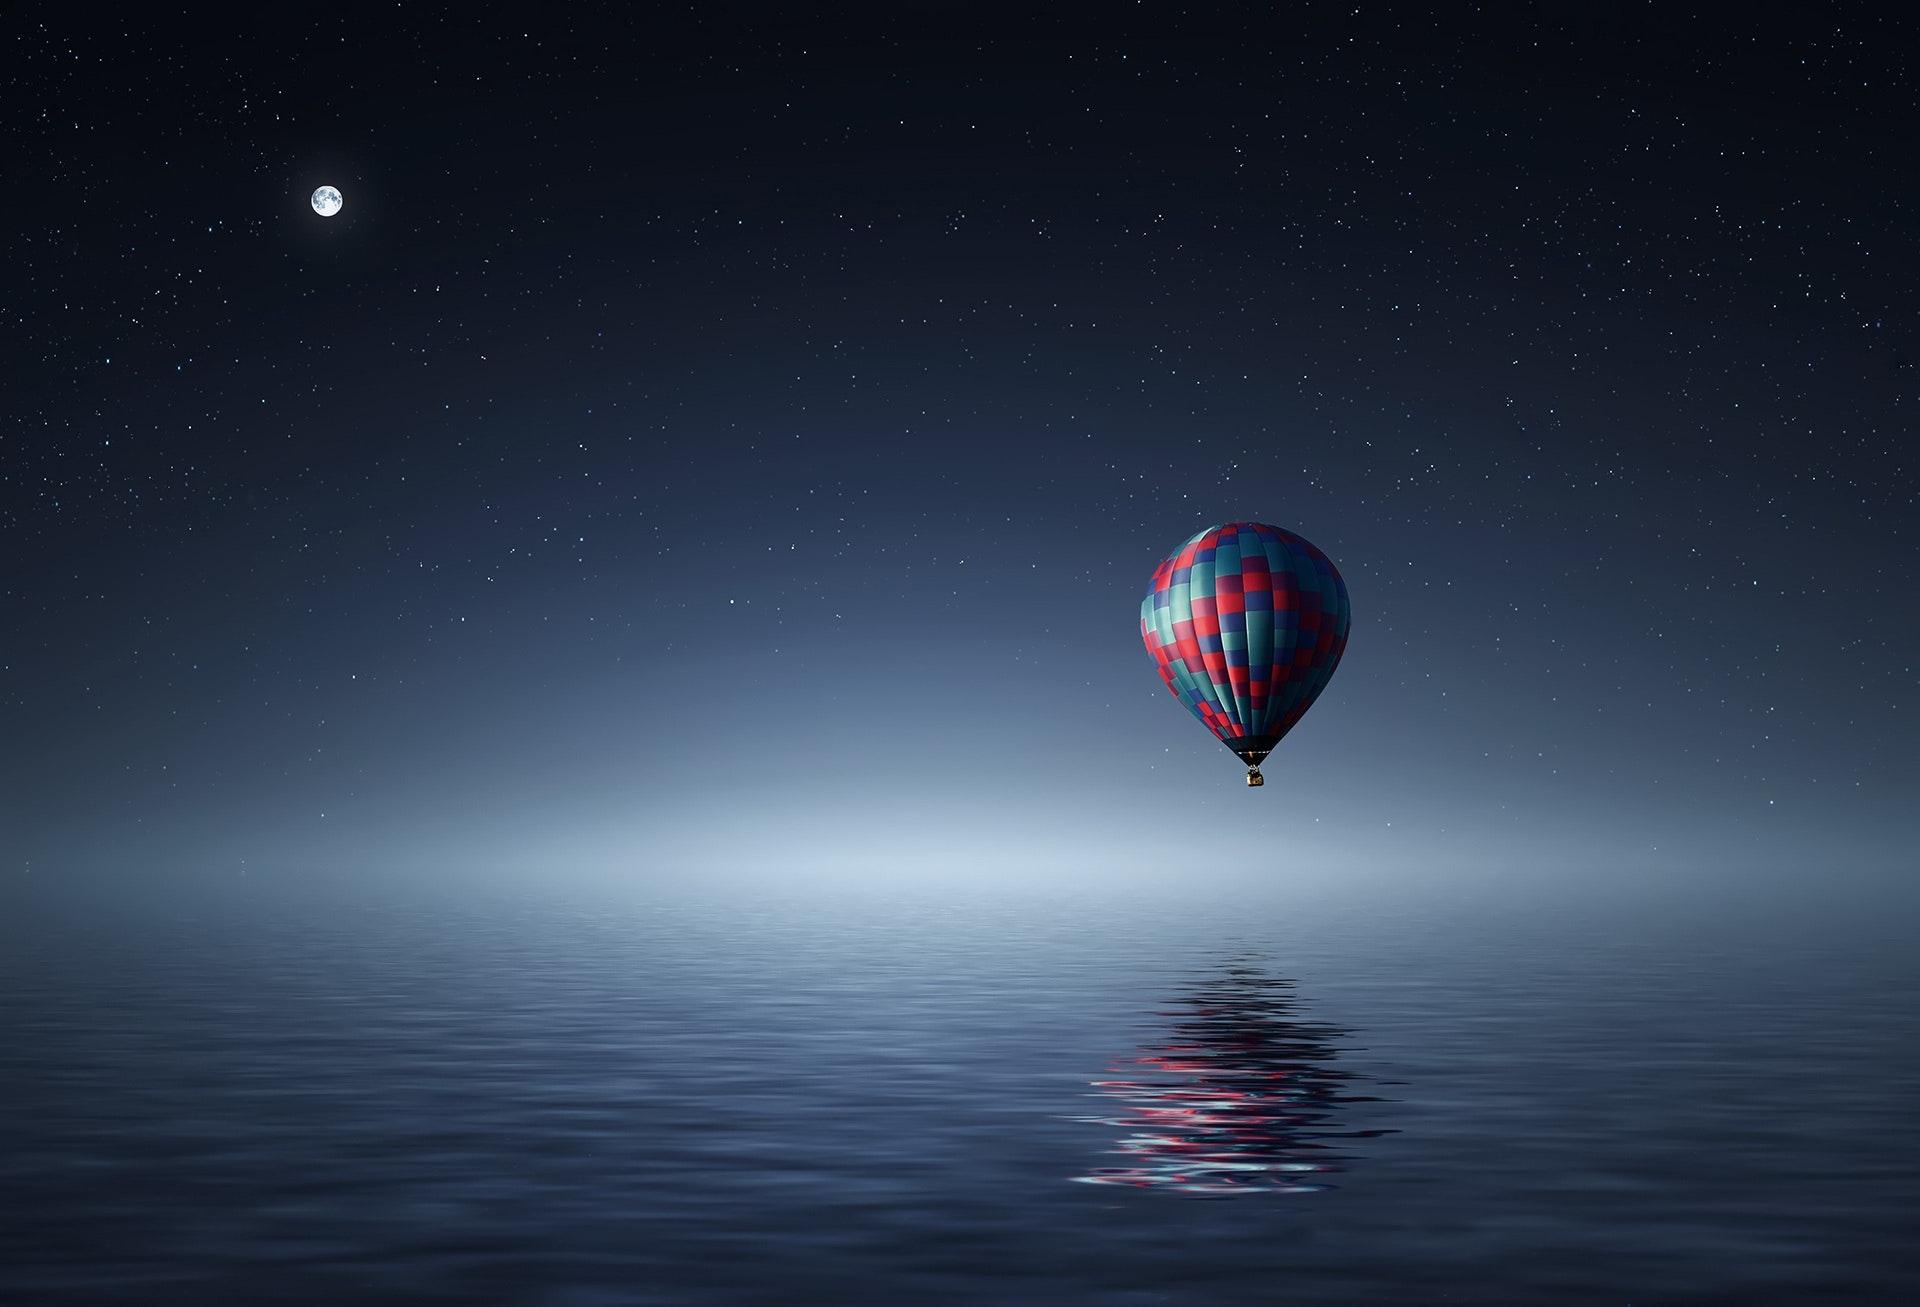 Kostenloses Foto Zum Thema Ballon Ballonfahren Coole